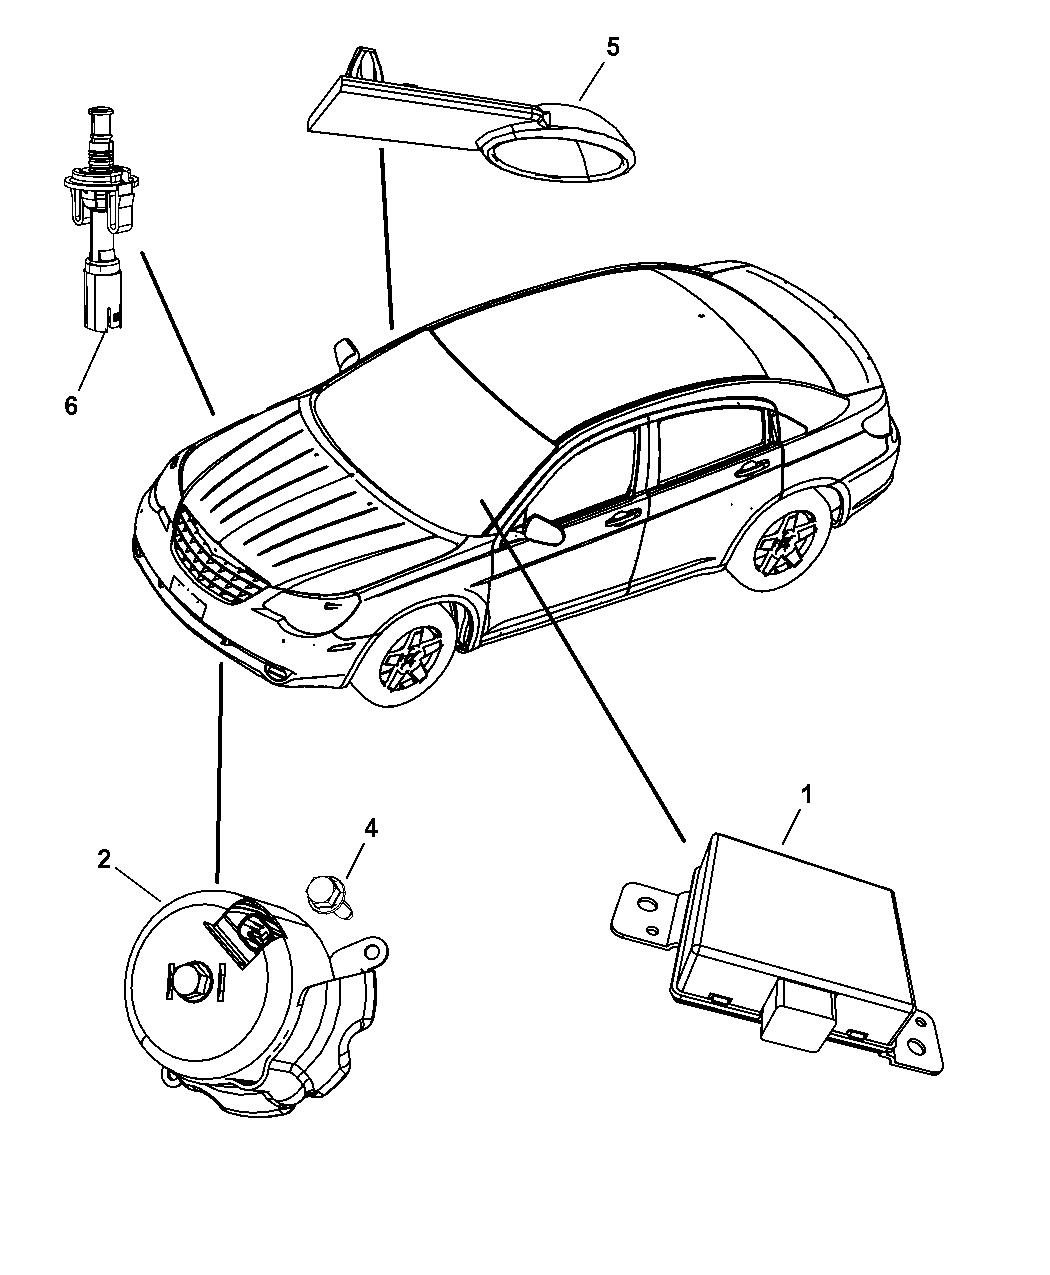 Power Steering Diagram Likewise 2003 Chrysler Sebring Fuse Box Diagram